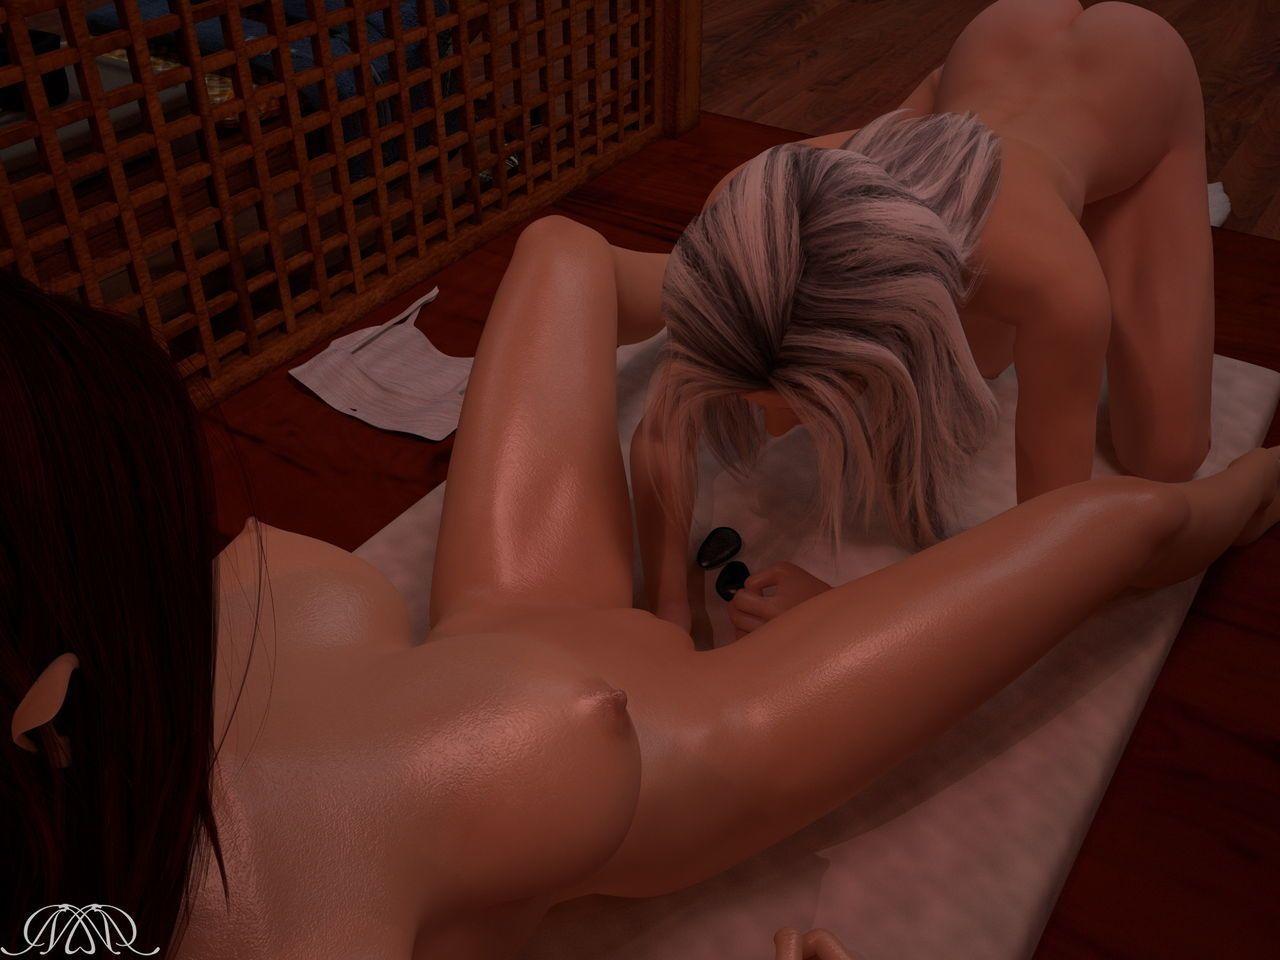 [Morfium] Afterwork Massage - part 7